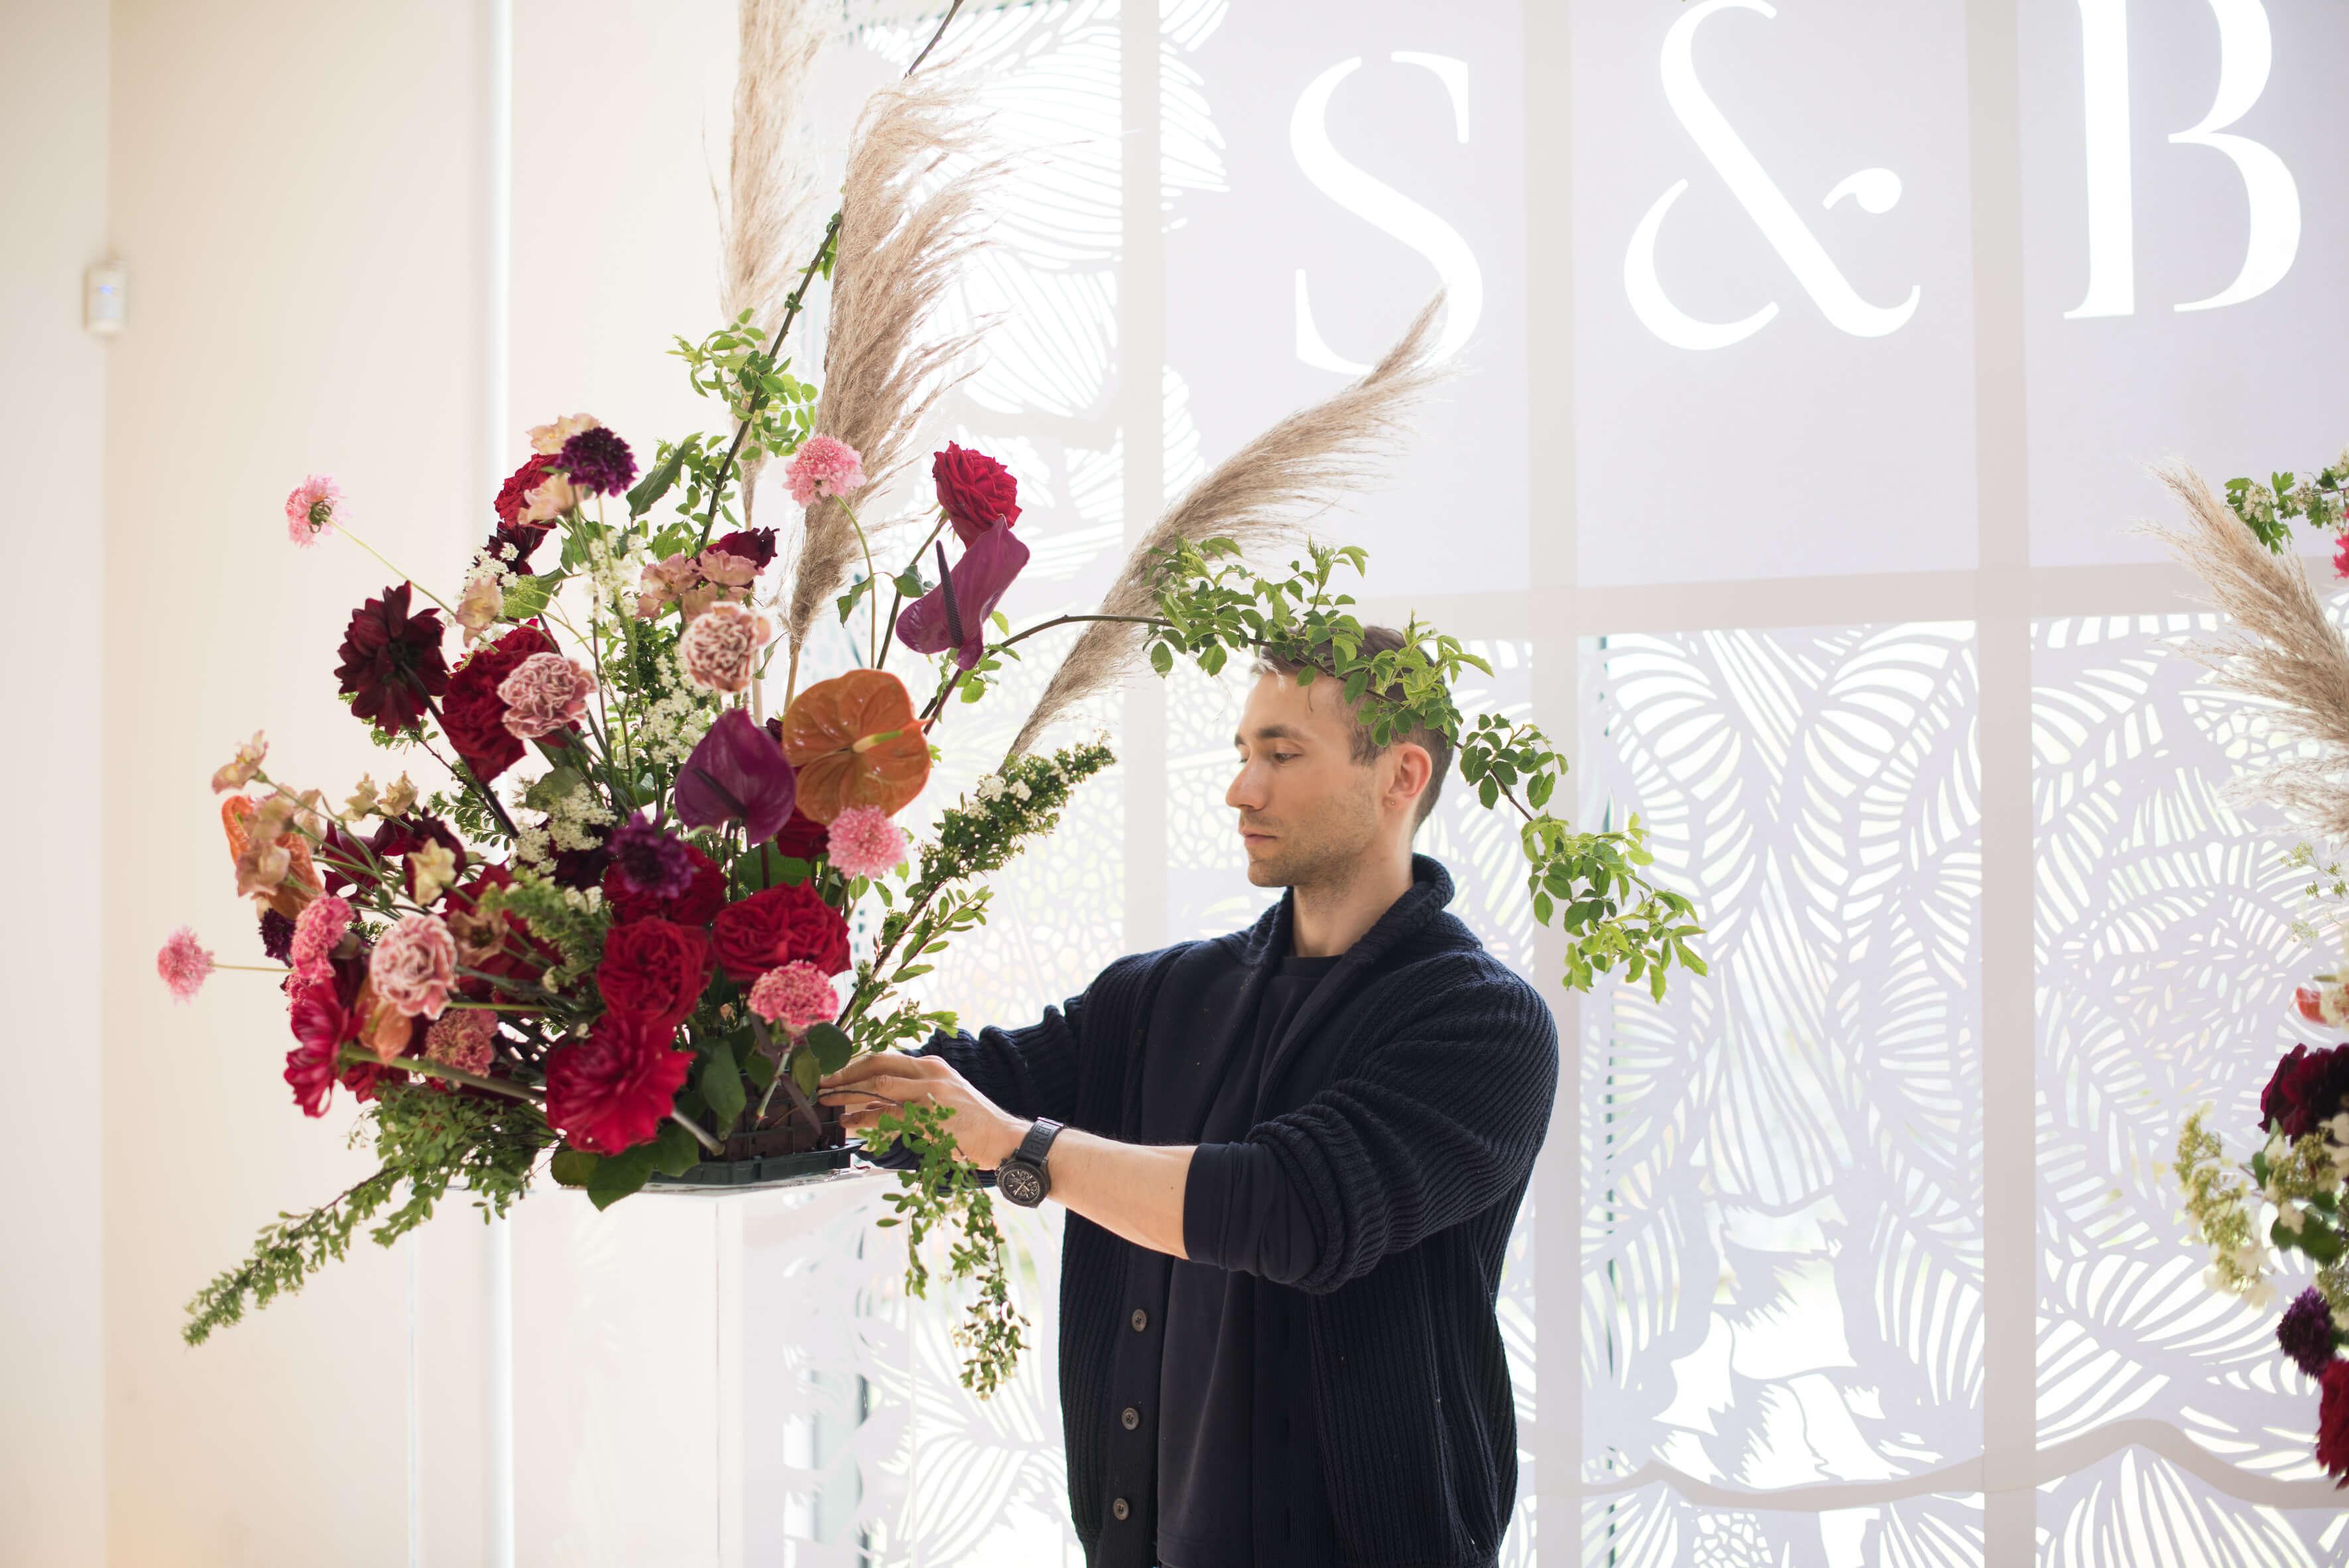 Michal Kowalski - Master Florist